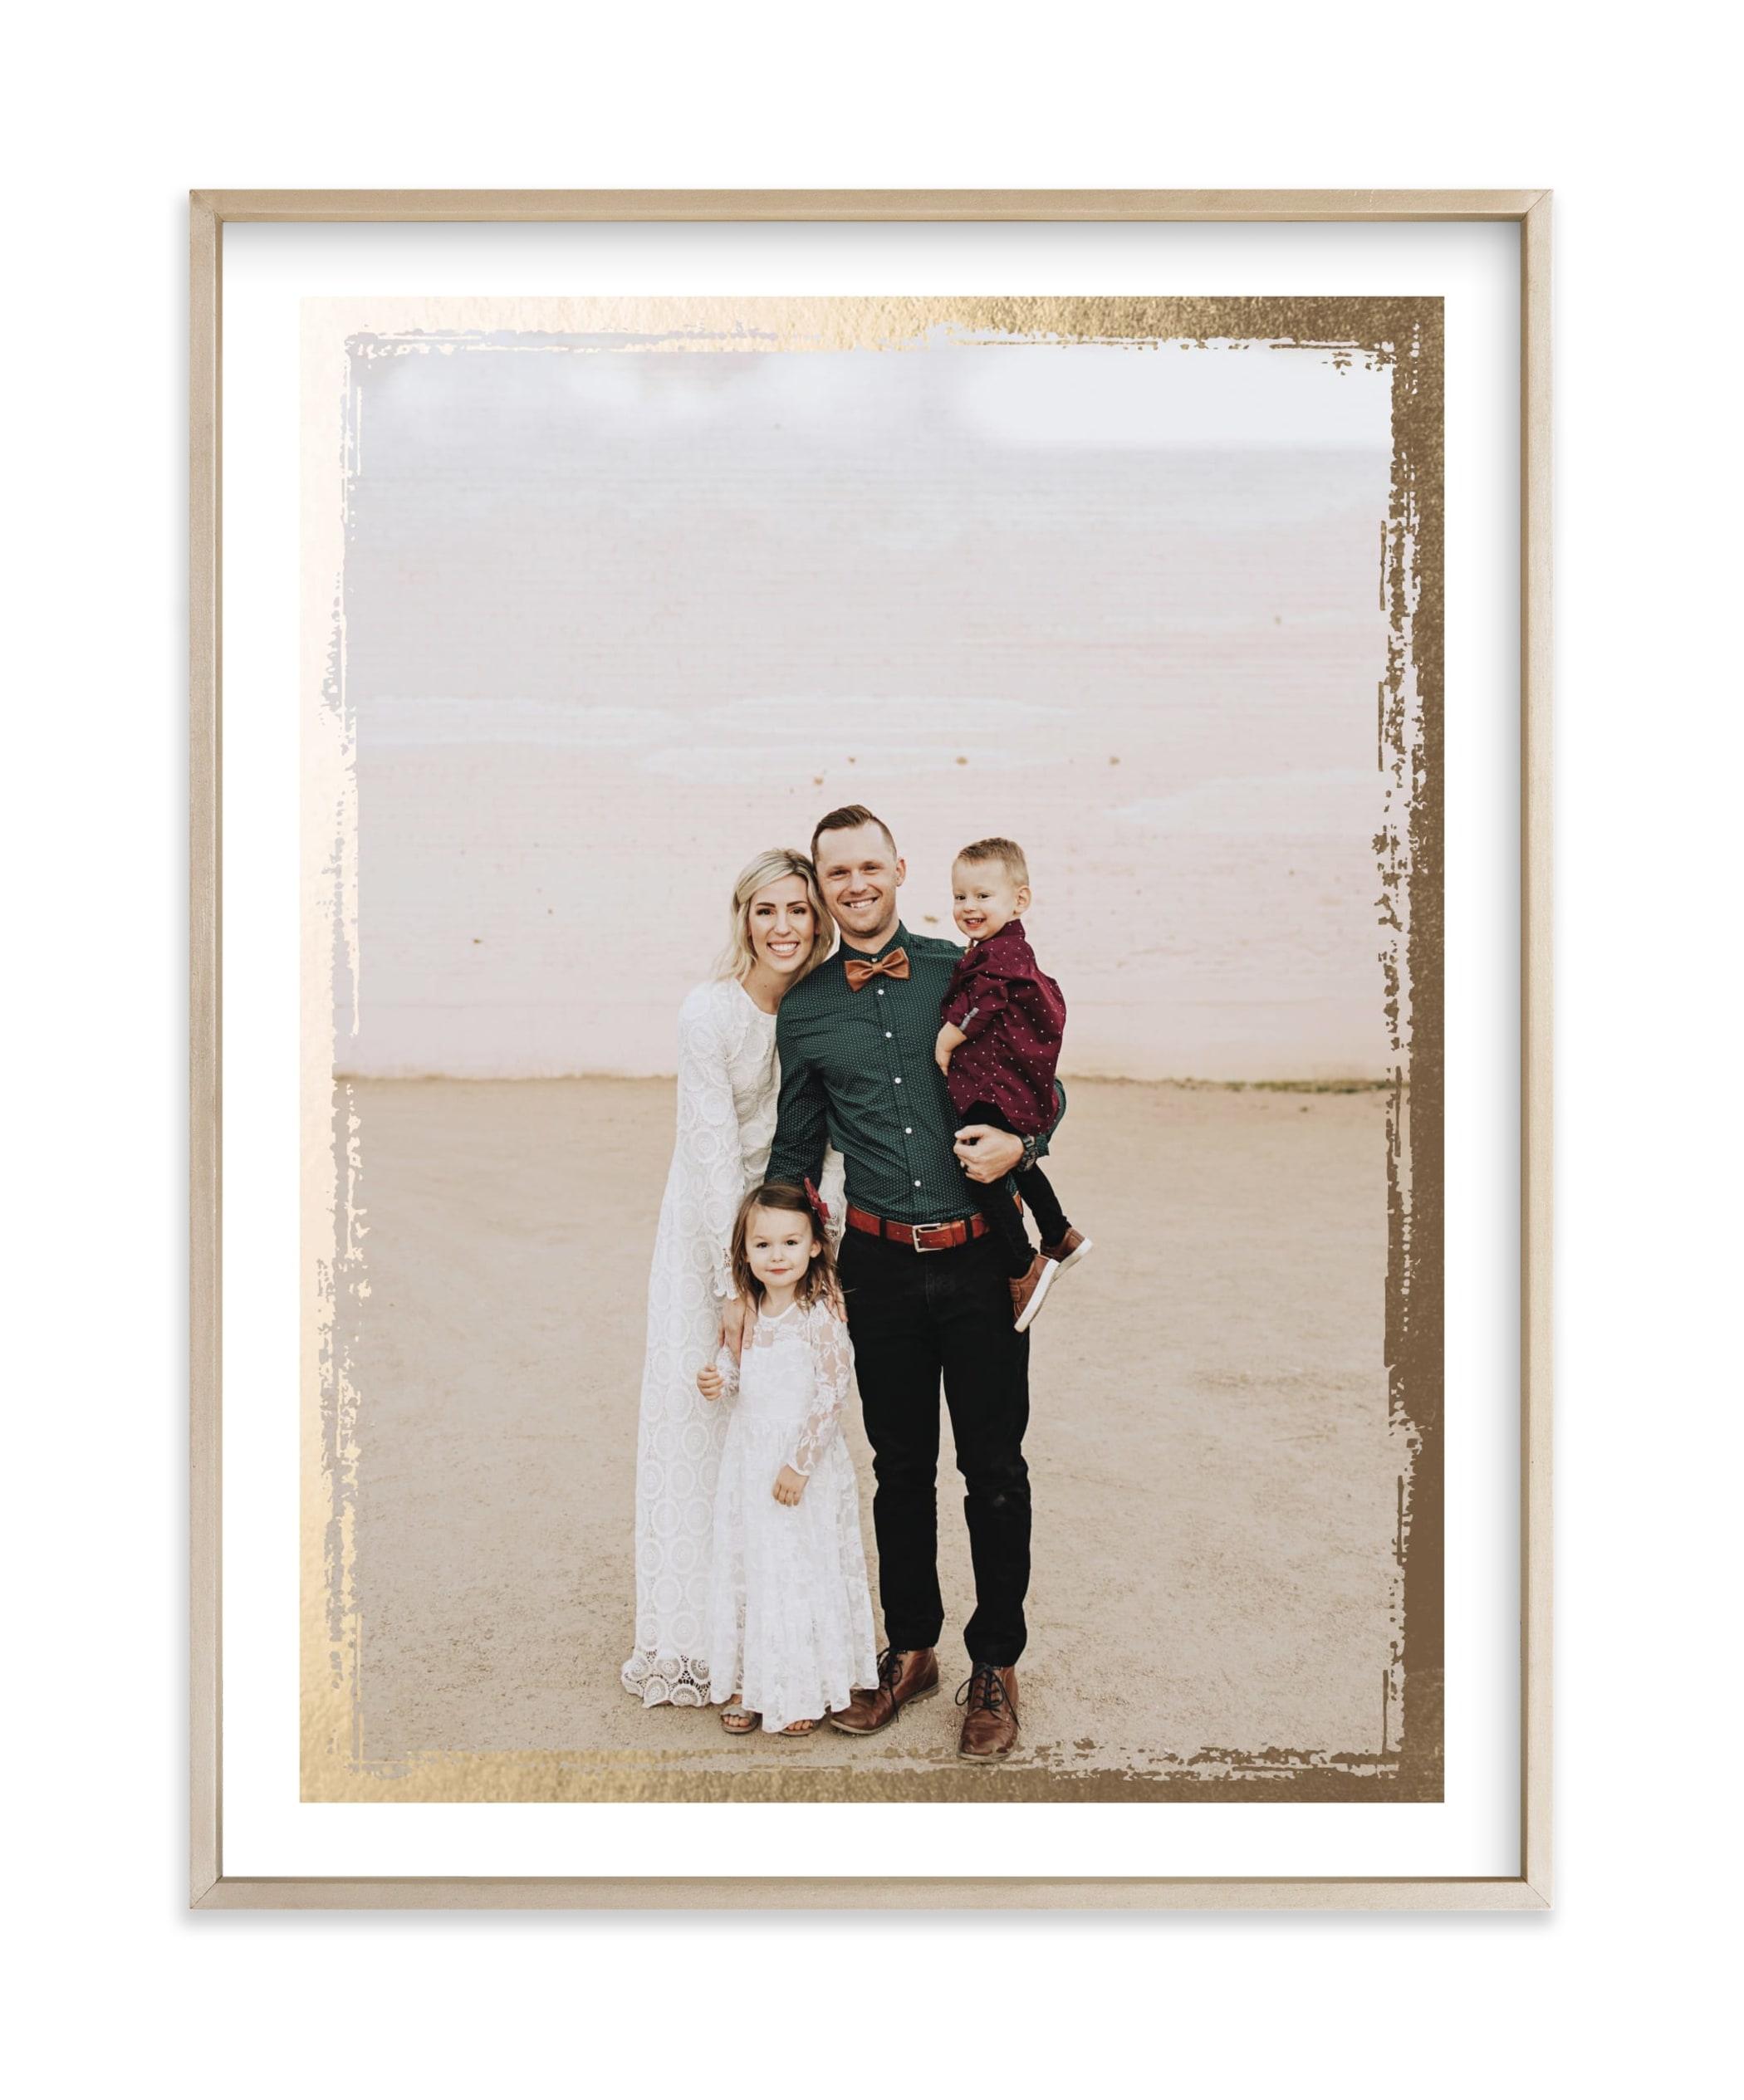 Rustic Edges Foil Pressed Photo Art Print